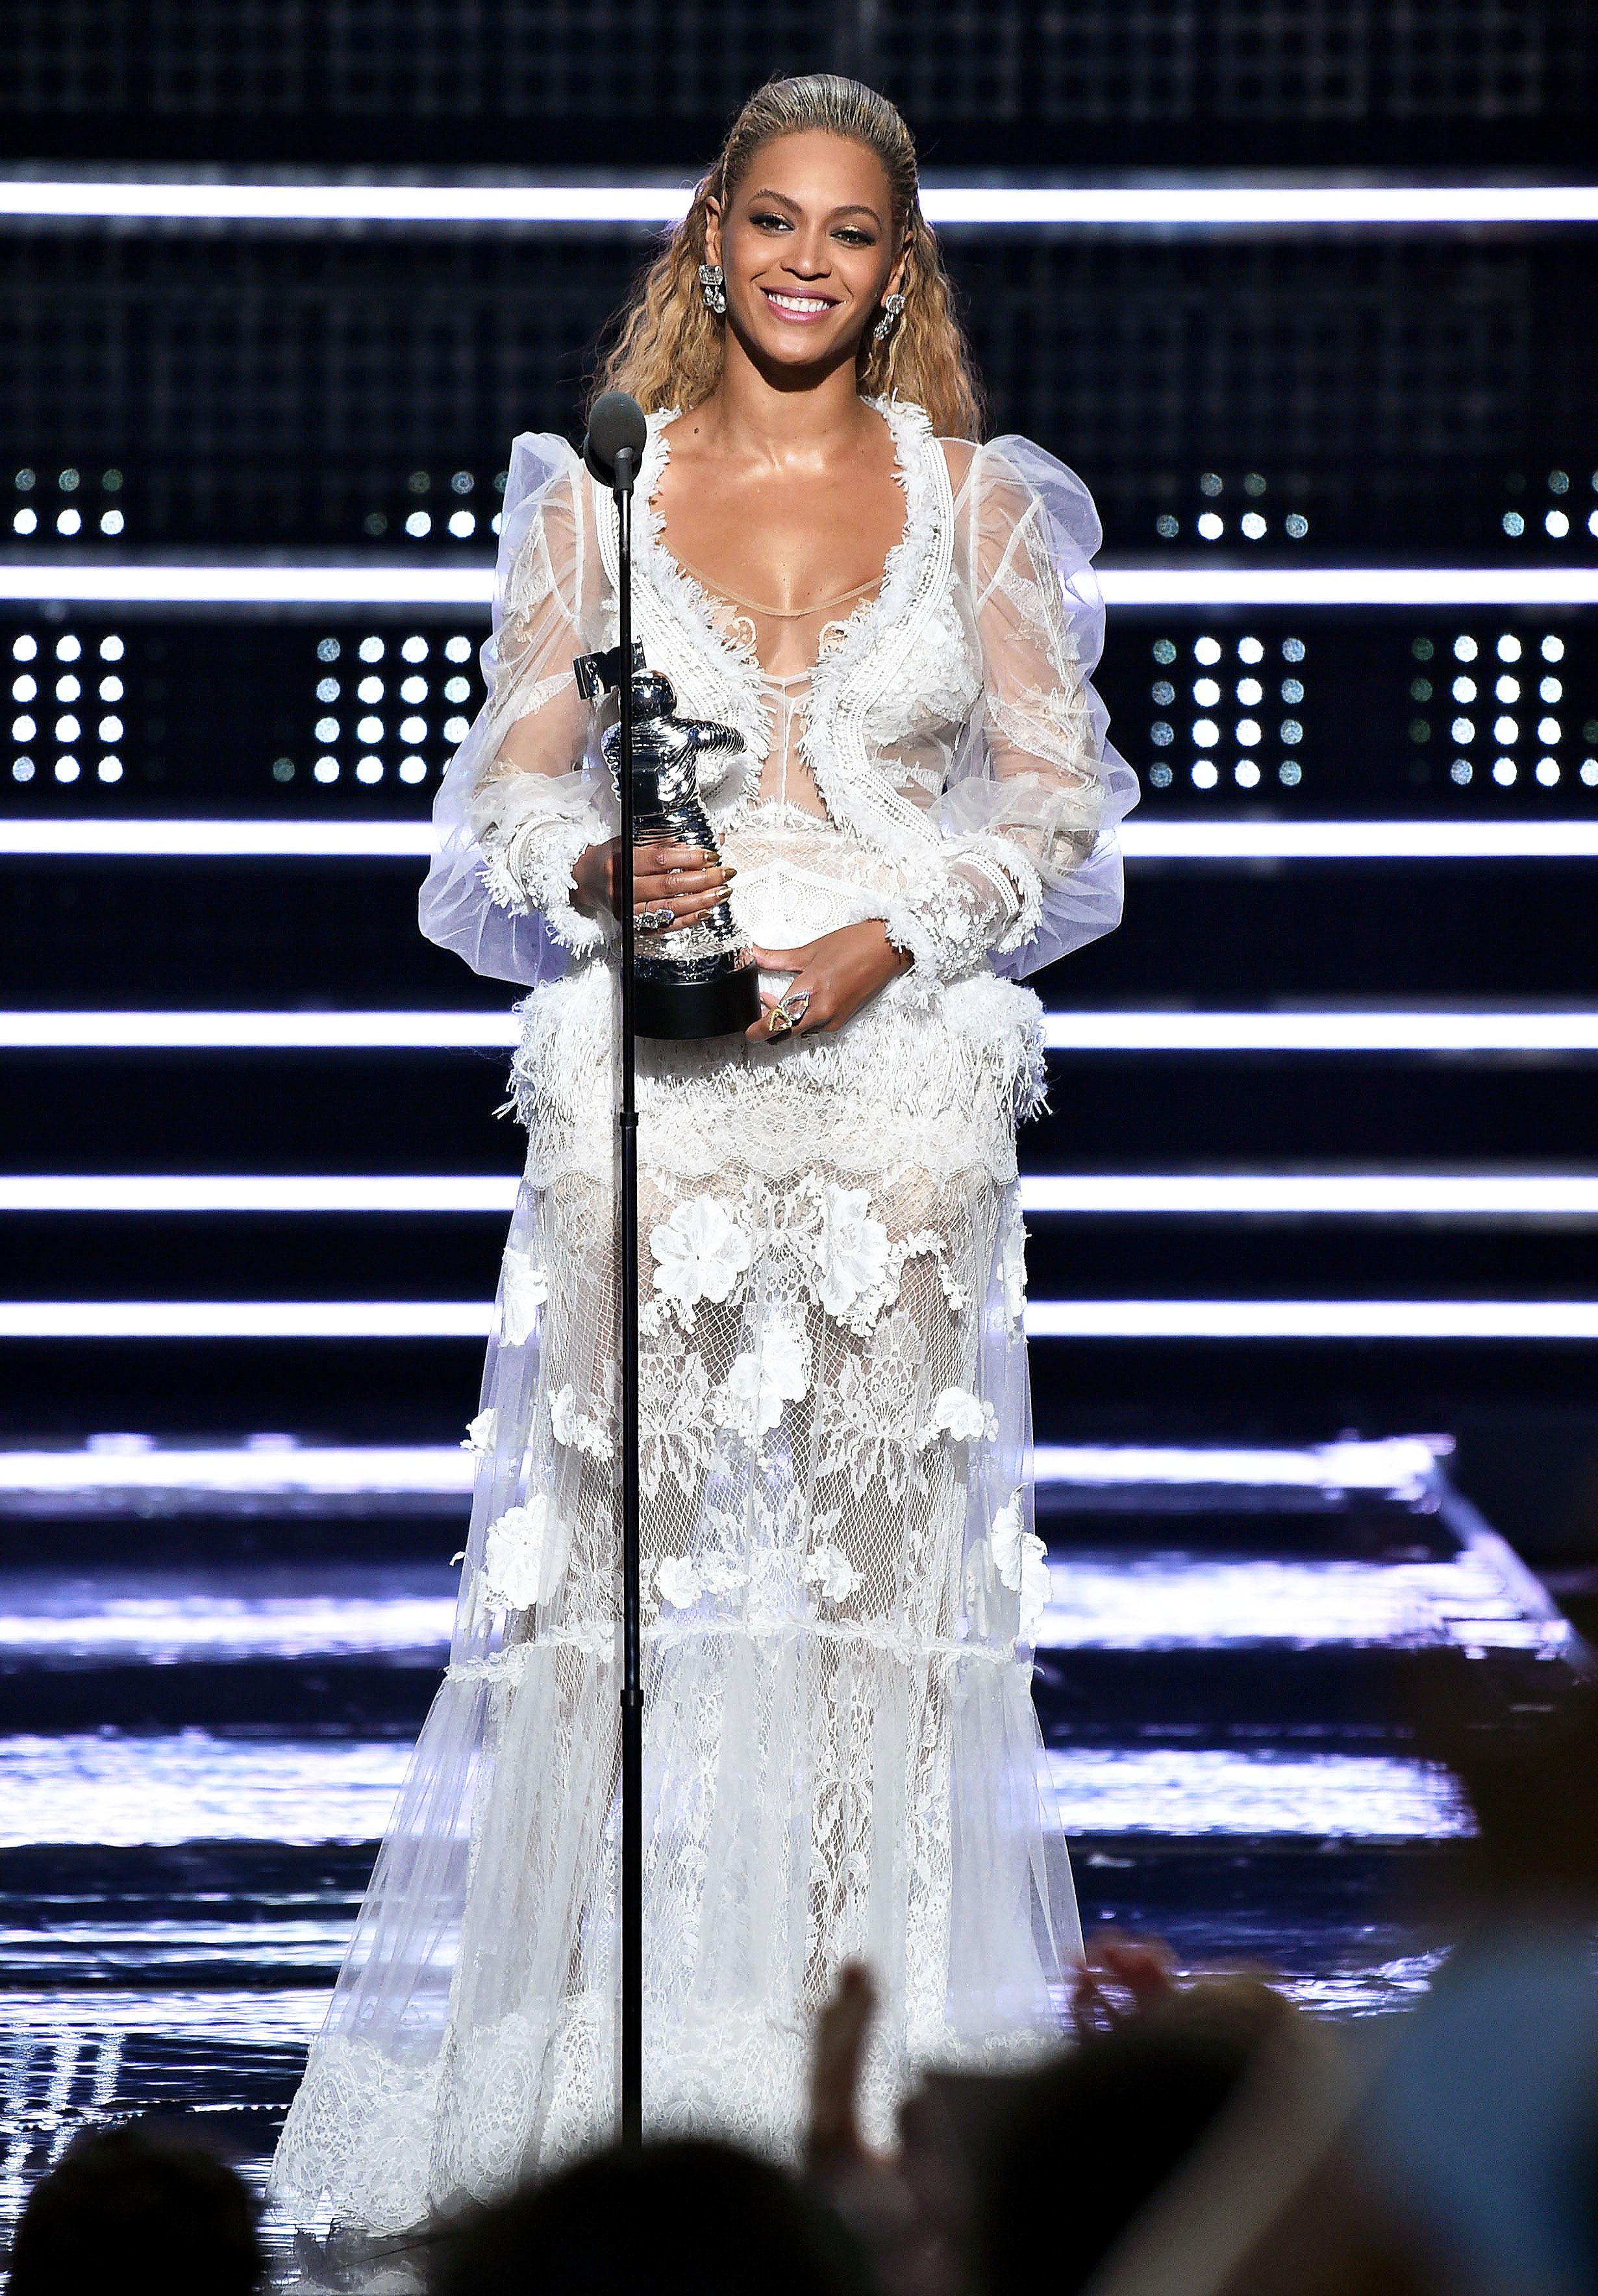 Beyonce Wore an Actual Wedding Dress at the 2016 VMAs